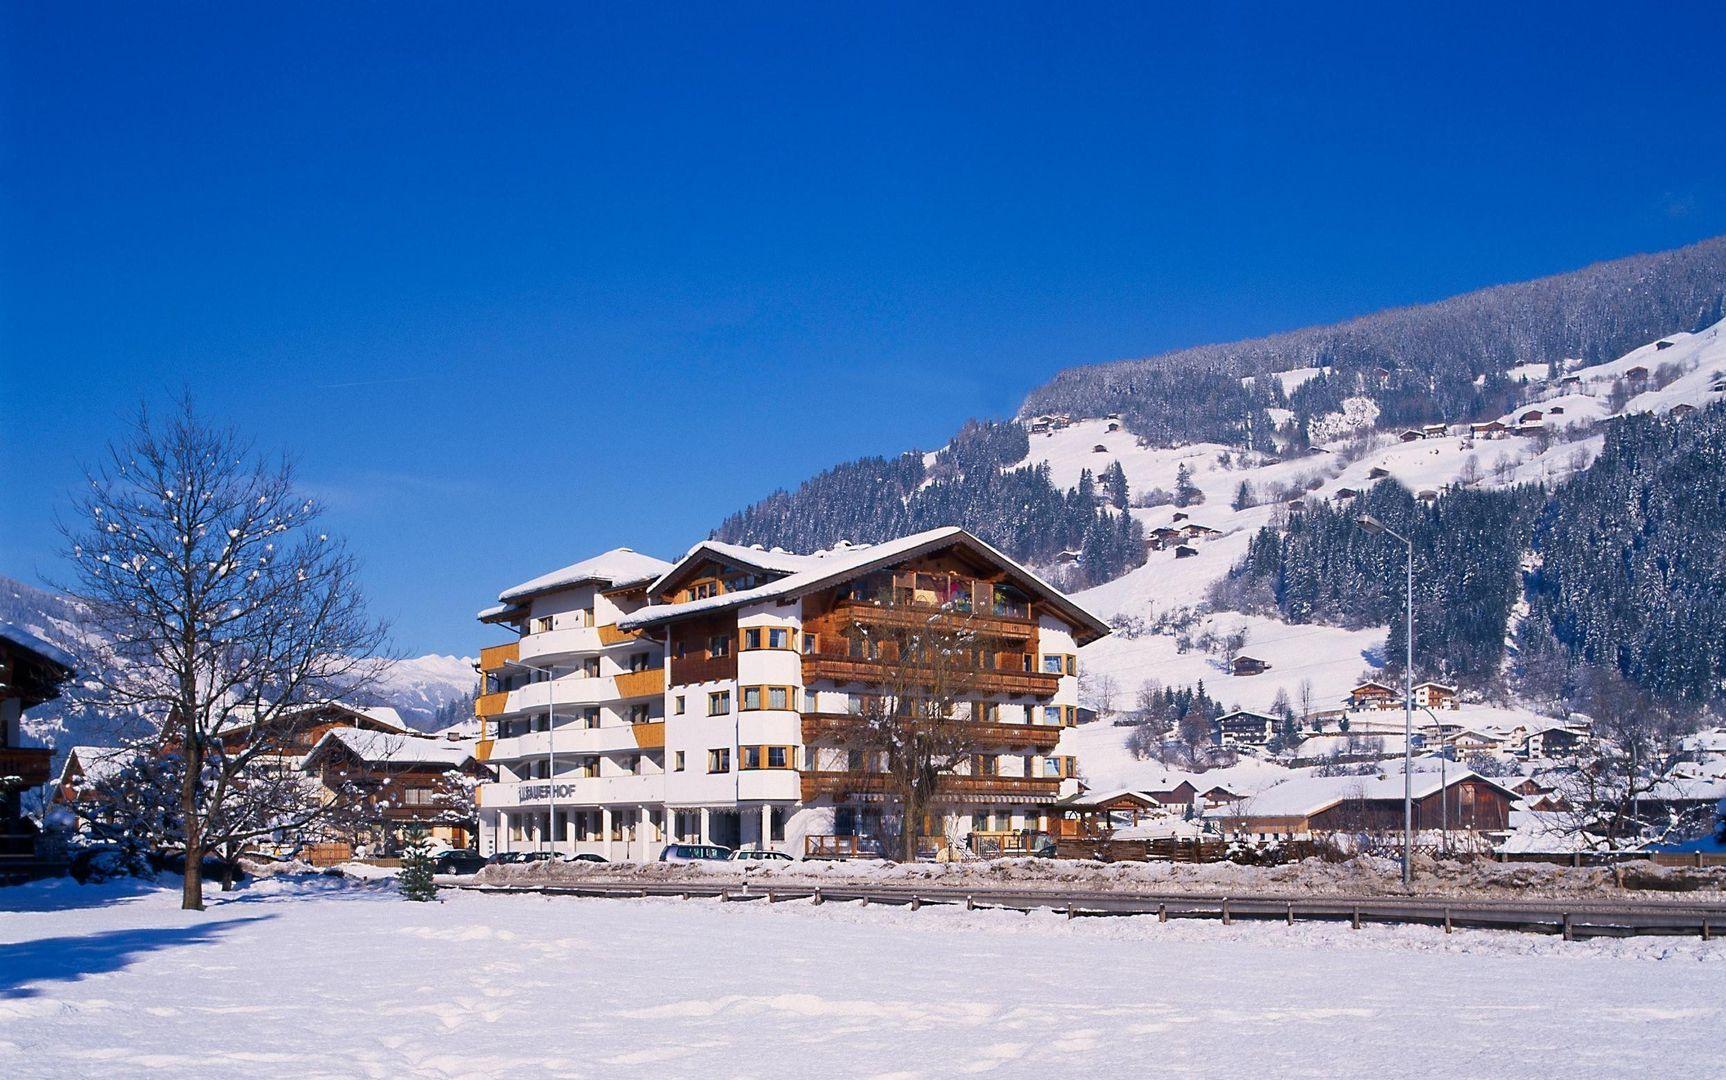 Alpenhotel Ramsauerhof [Preţ economic]